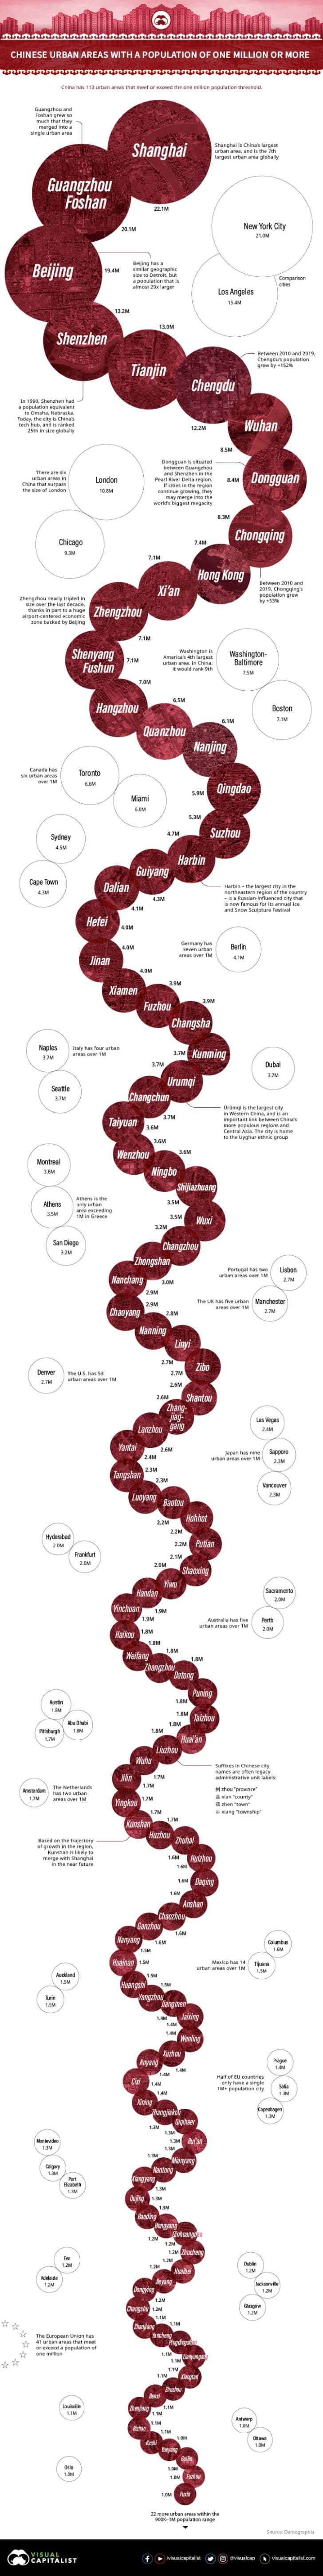 grafico ciudades chinas(1)